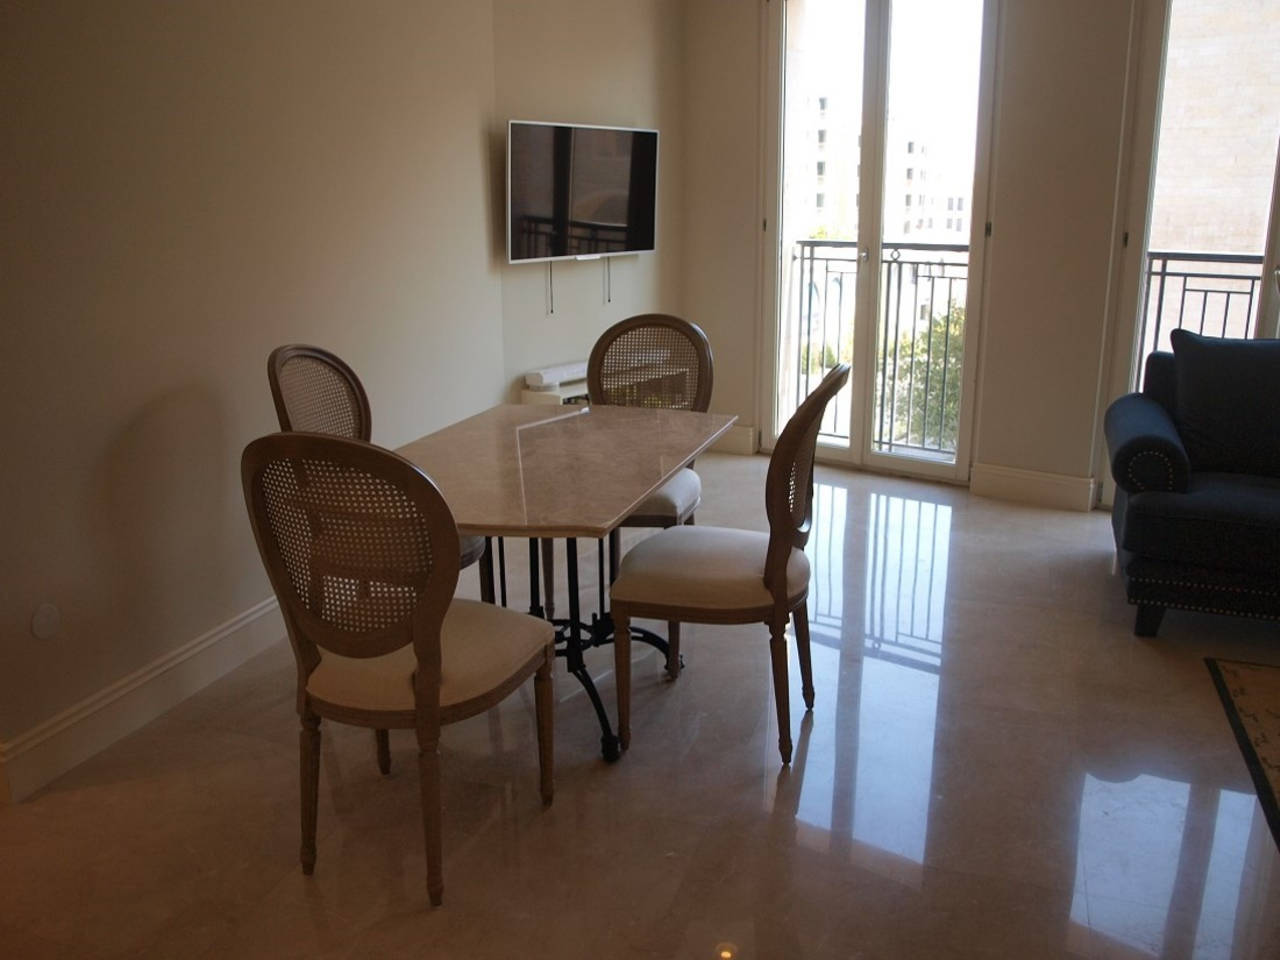 Apartment Great Location - Mamilla Mall Super Luxurious Flat photo 16817593